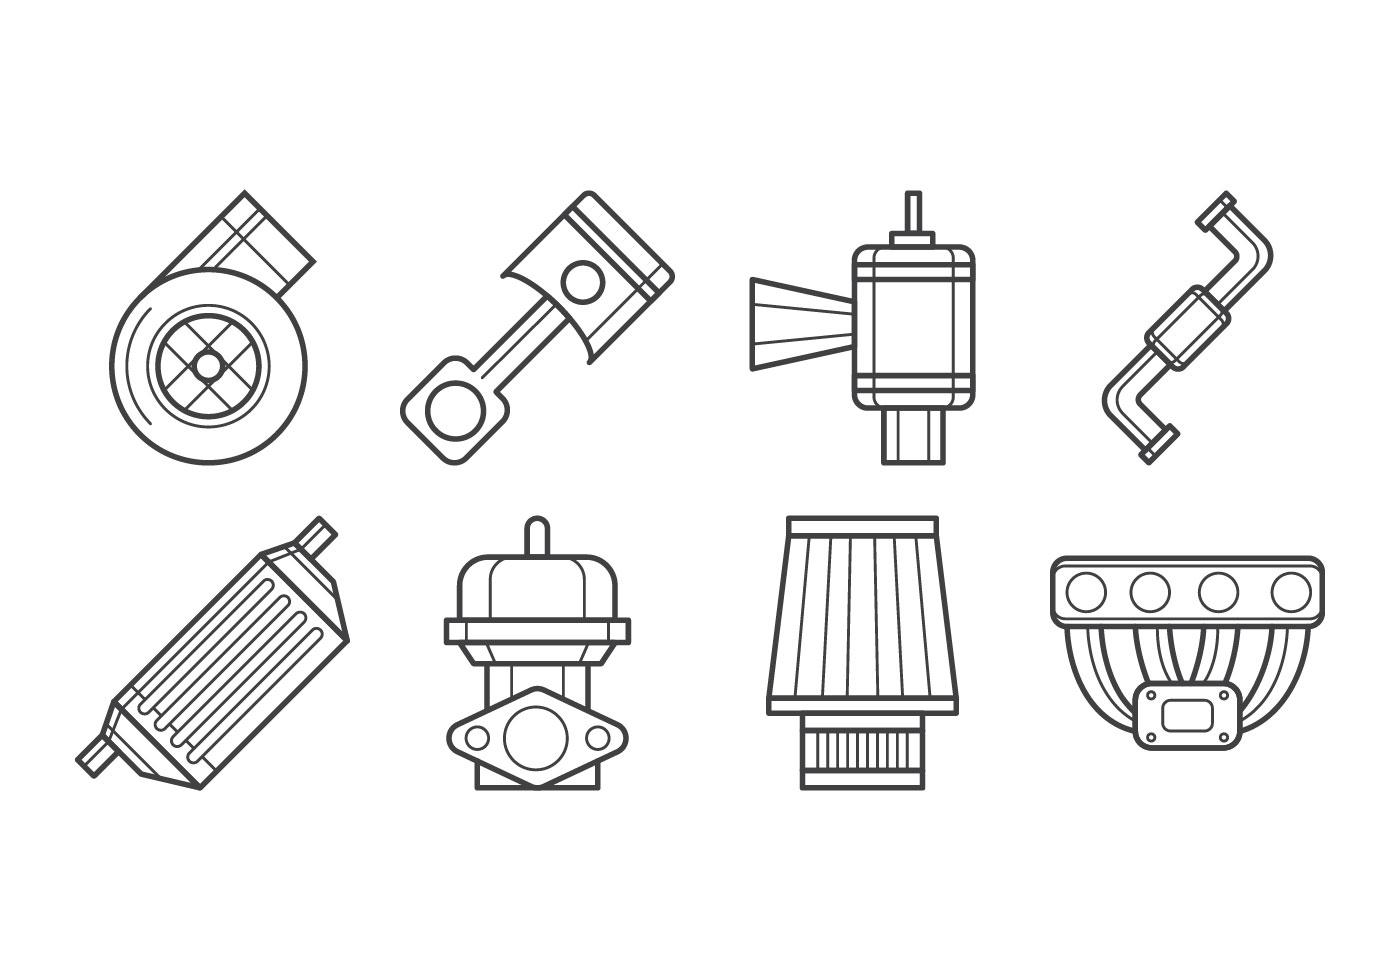 Turbo Kit Icon Vector